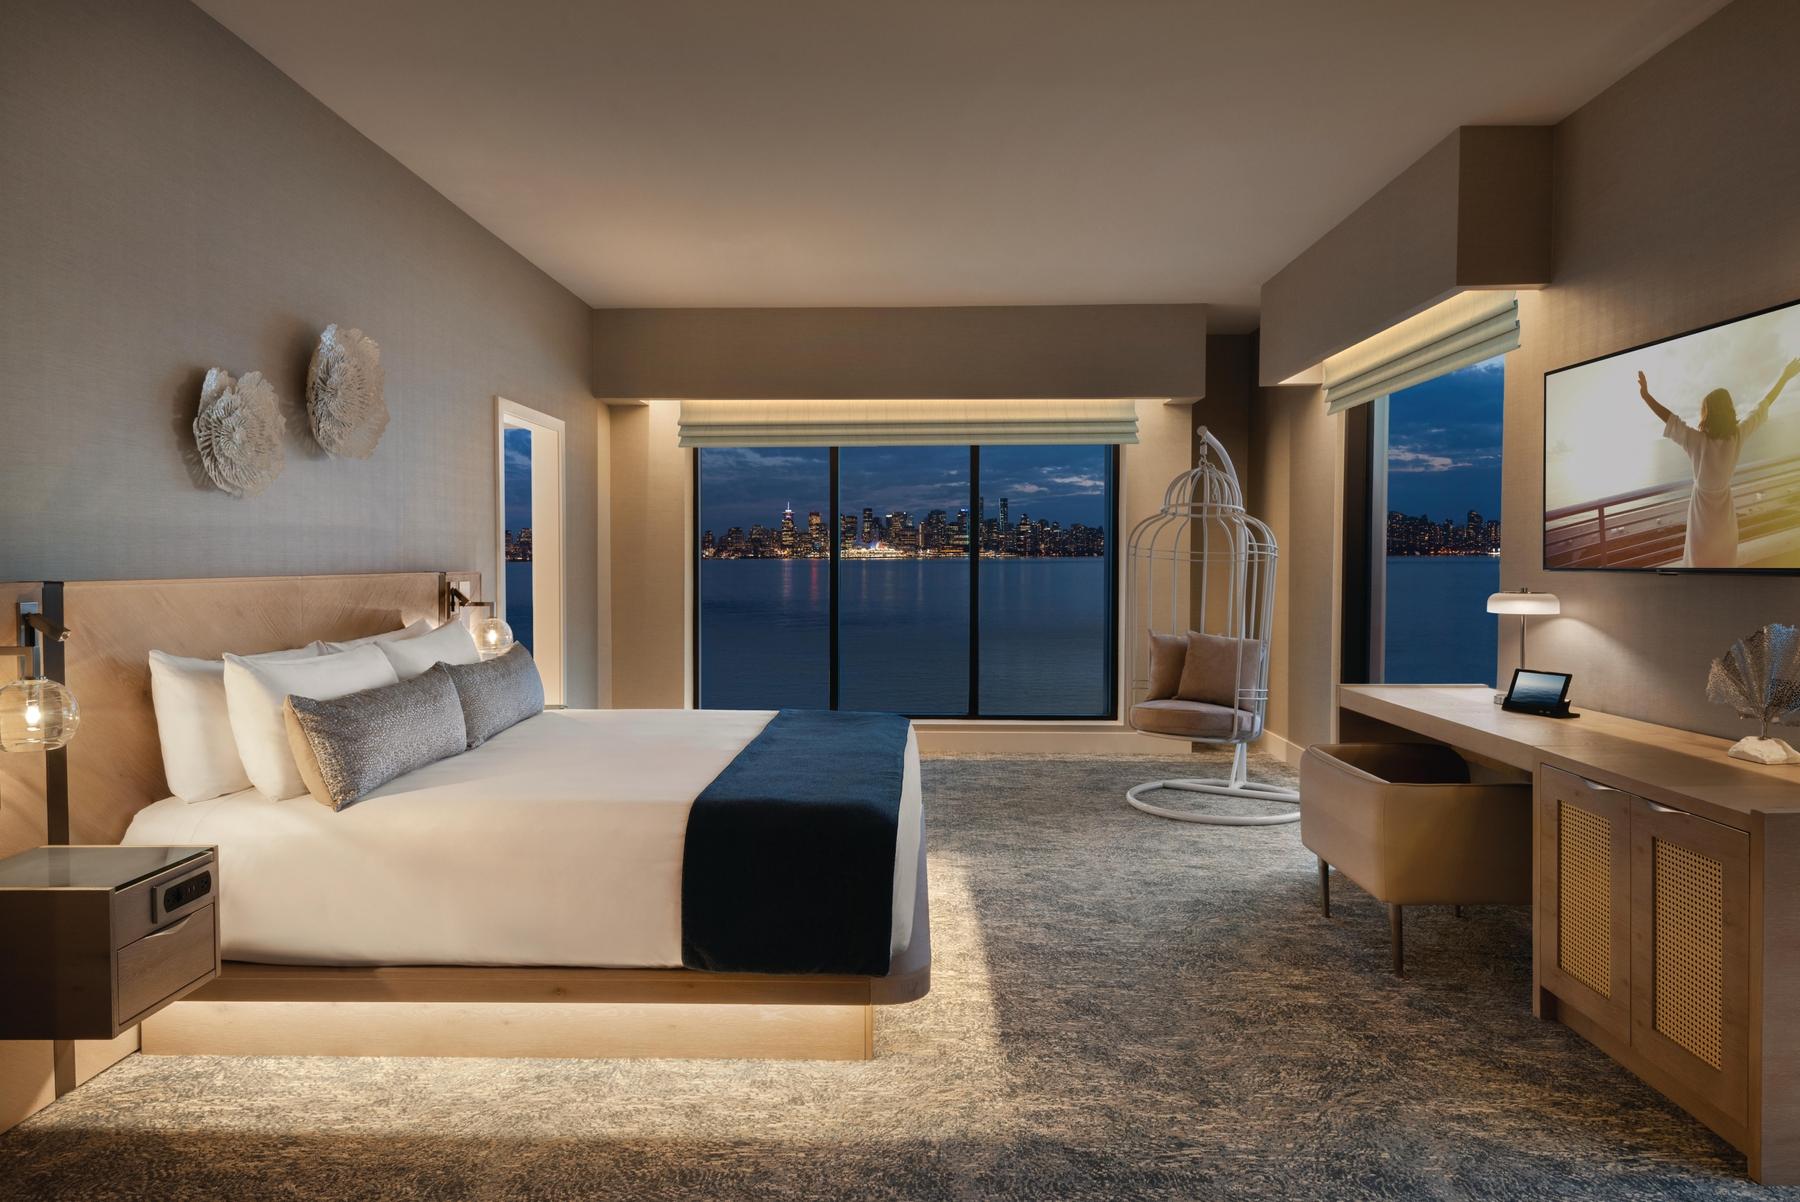 Bedroom at Seaside Vancouver hotel